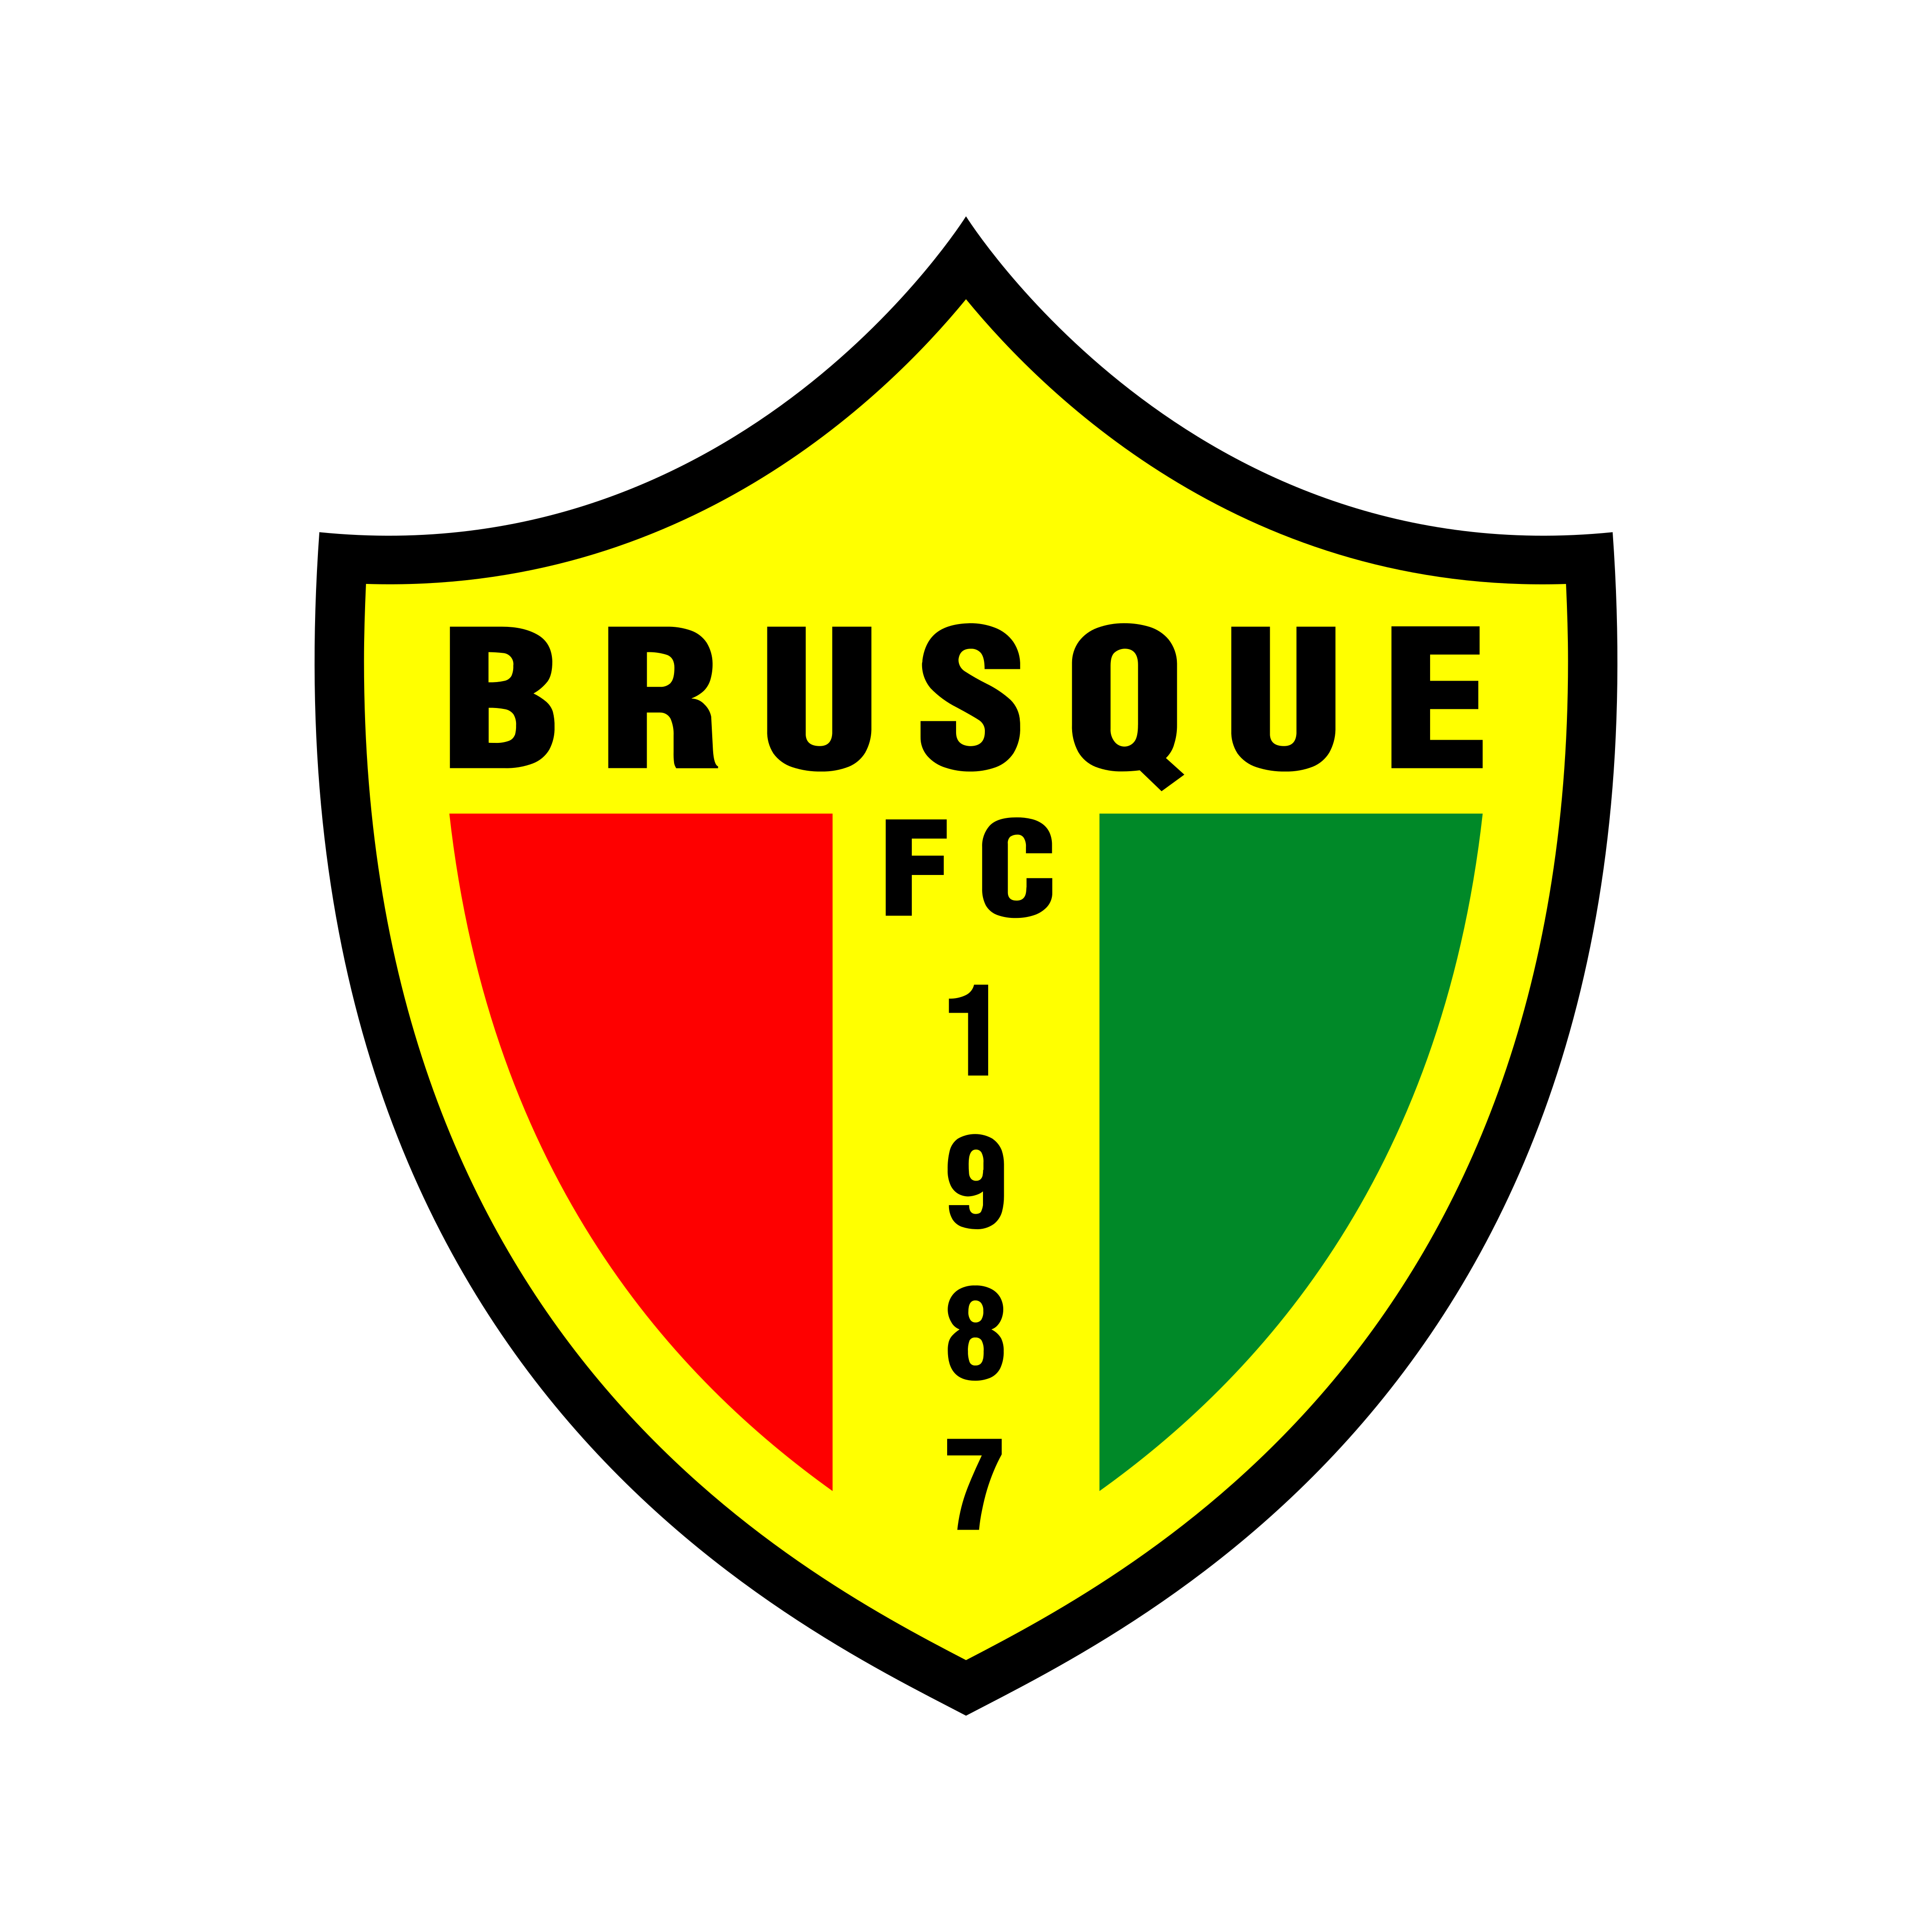 brusque fc logo 0 - Brusque FC Logo (Brazil)